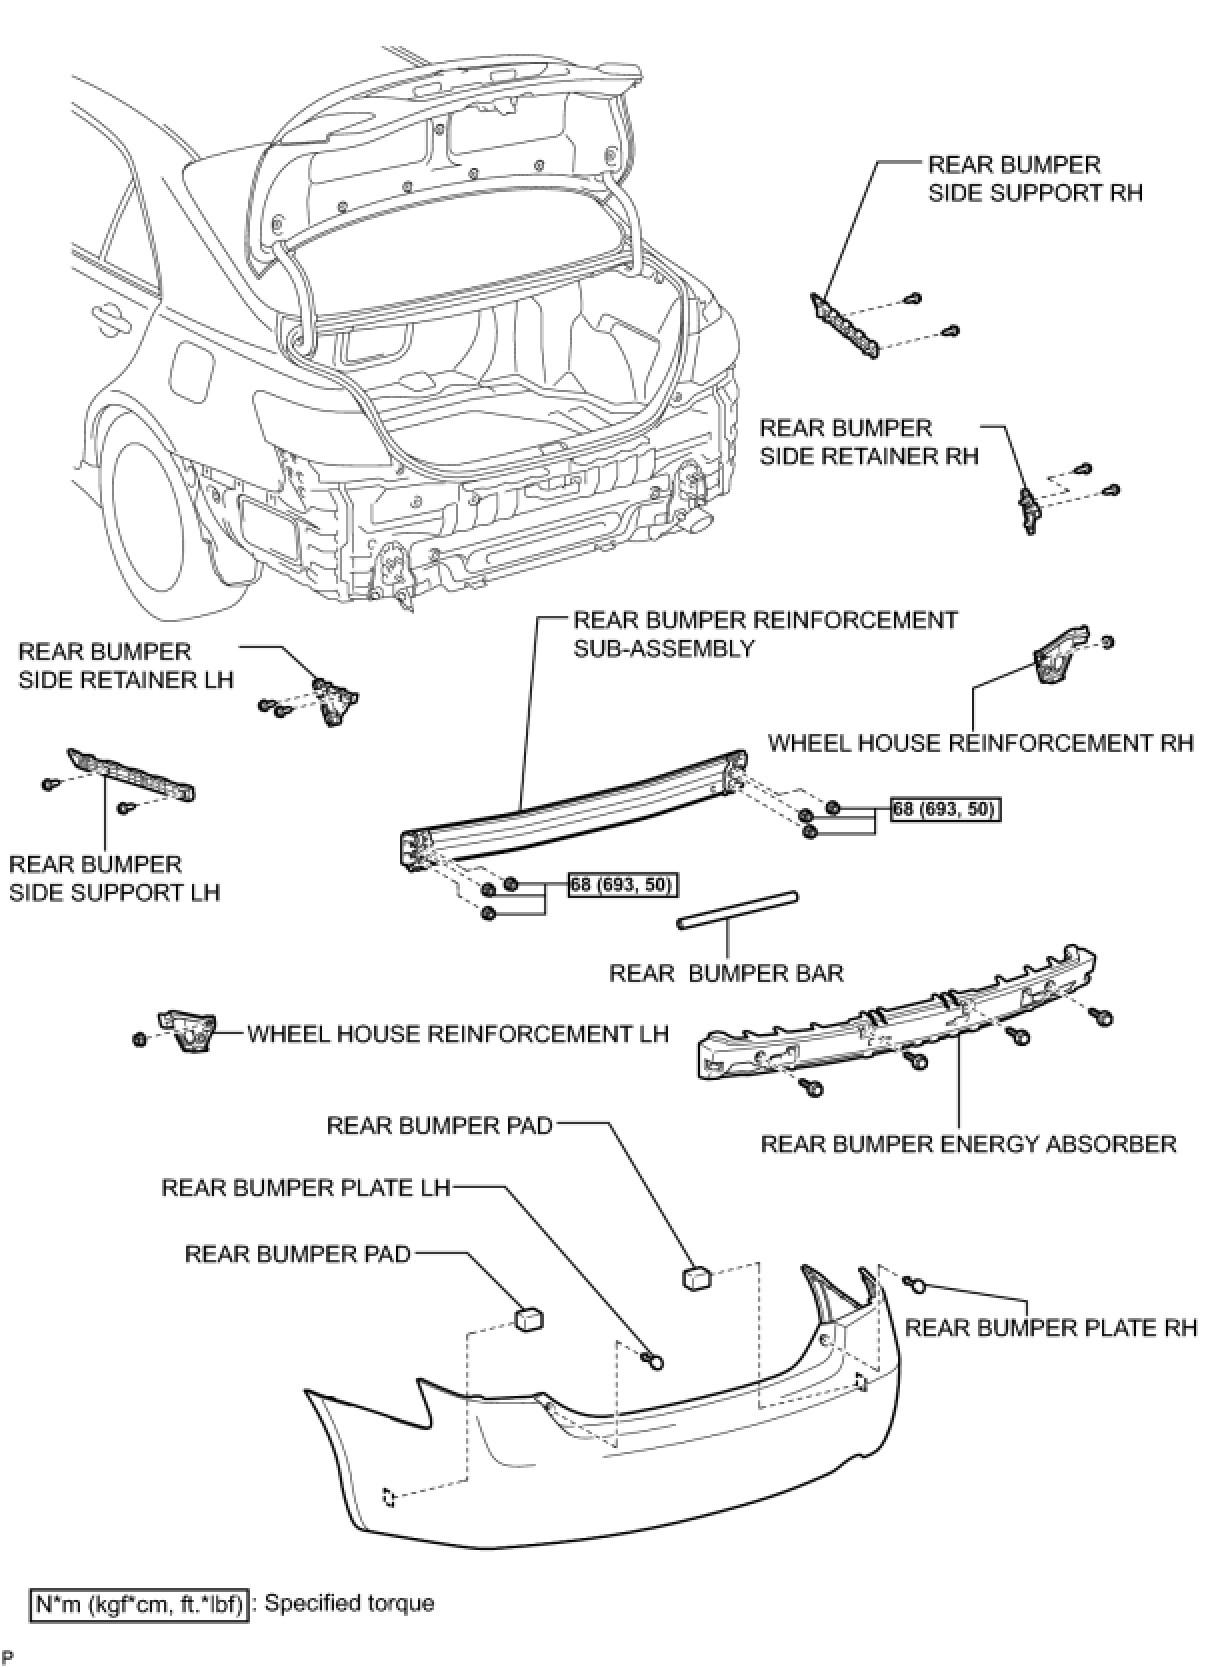 The edge of passenger side rear quarter panel is bent ...